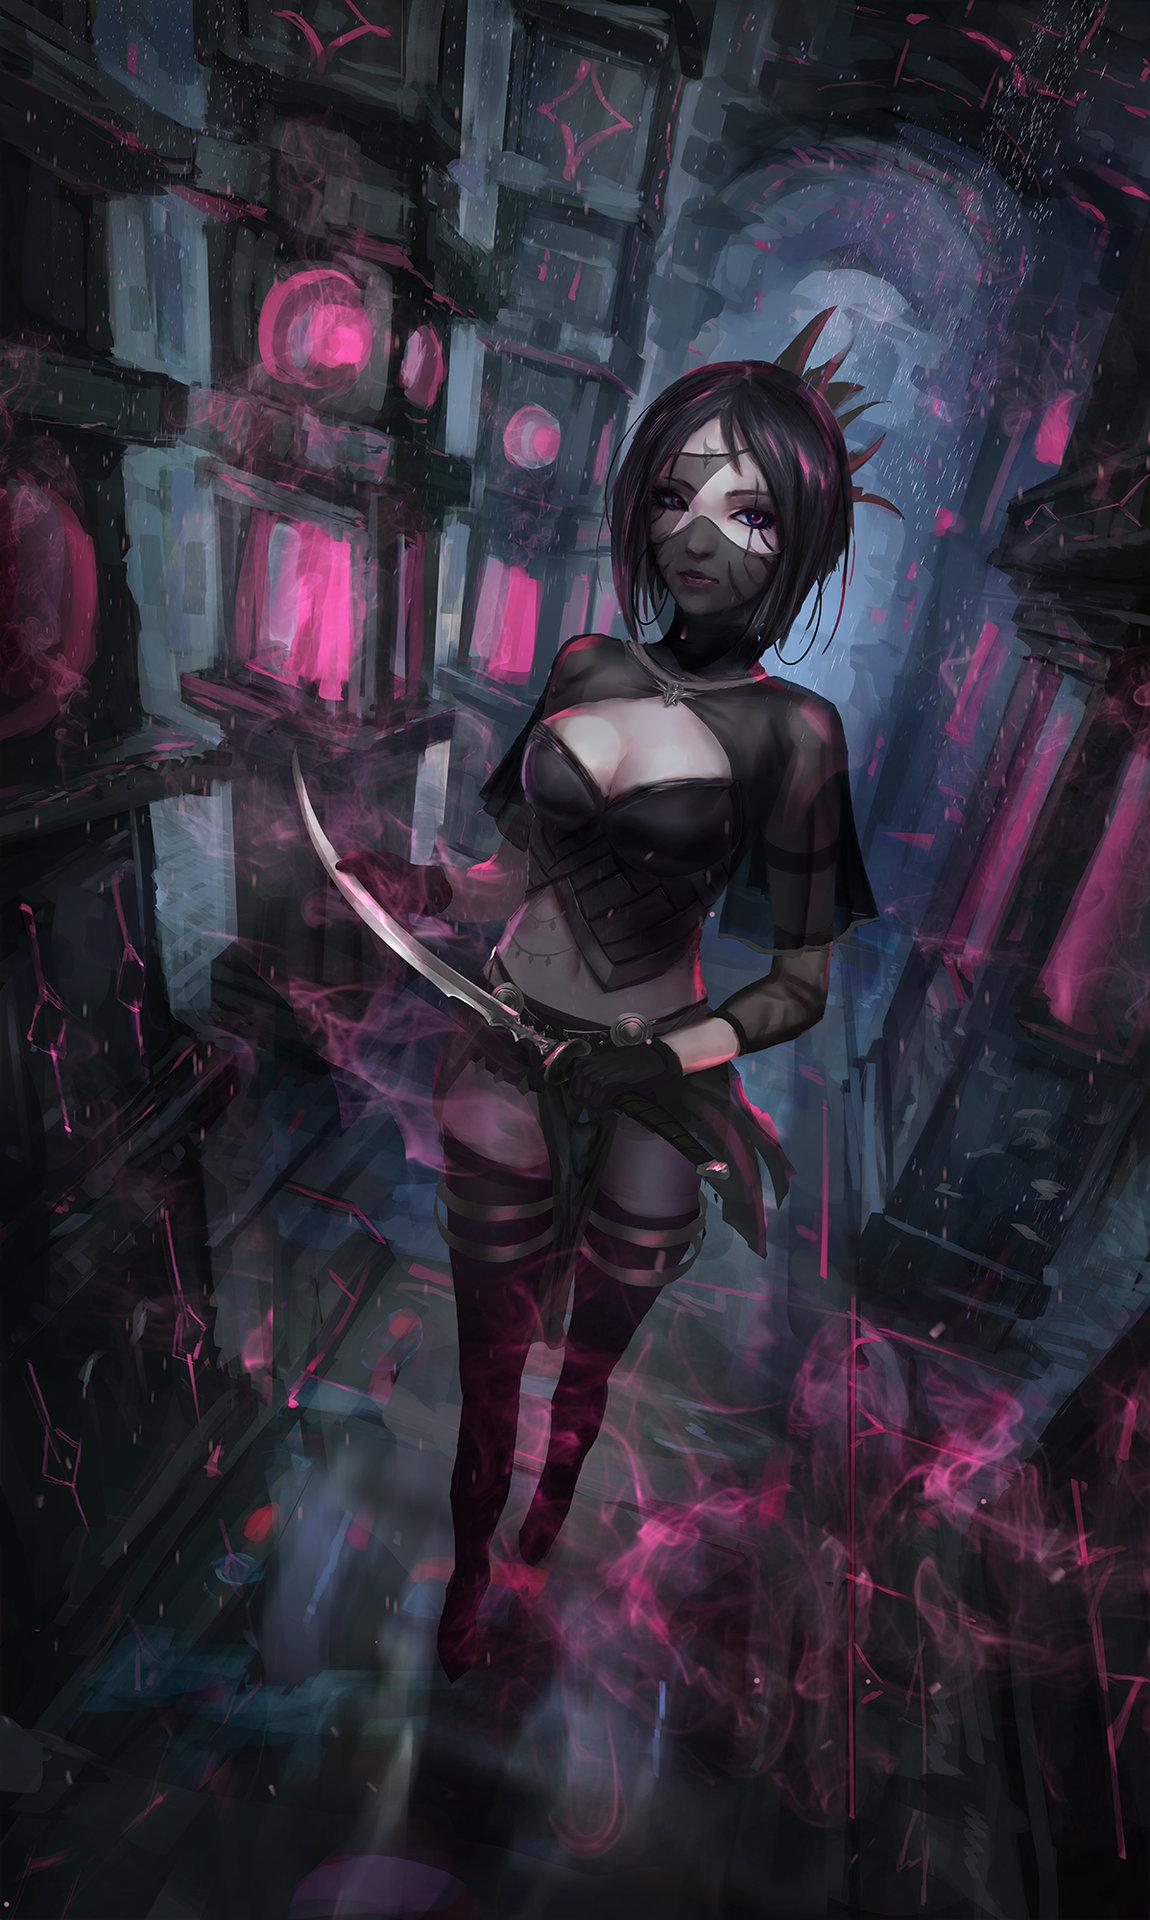 yong-hui-ng-blackgirl-7-2000px